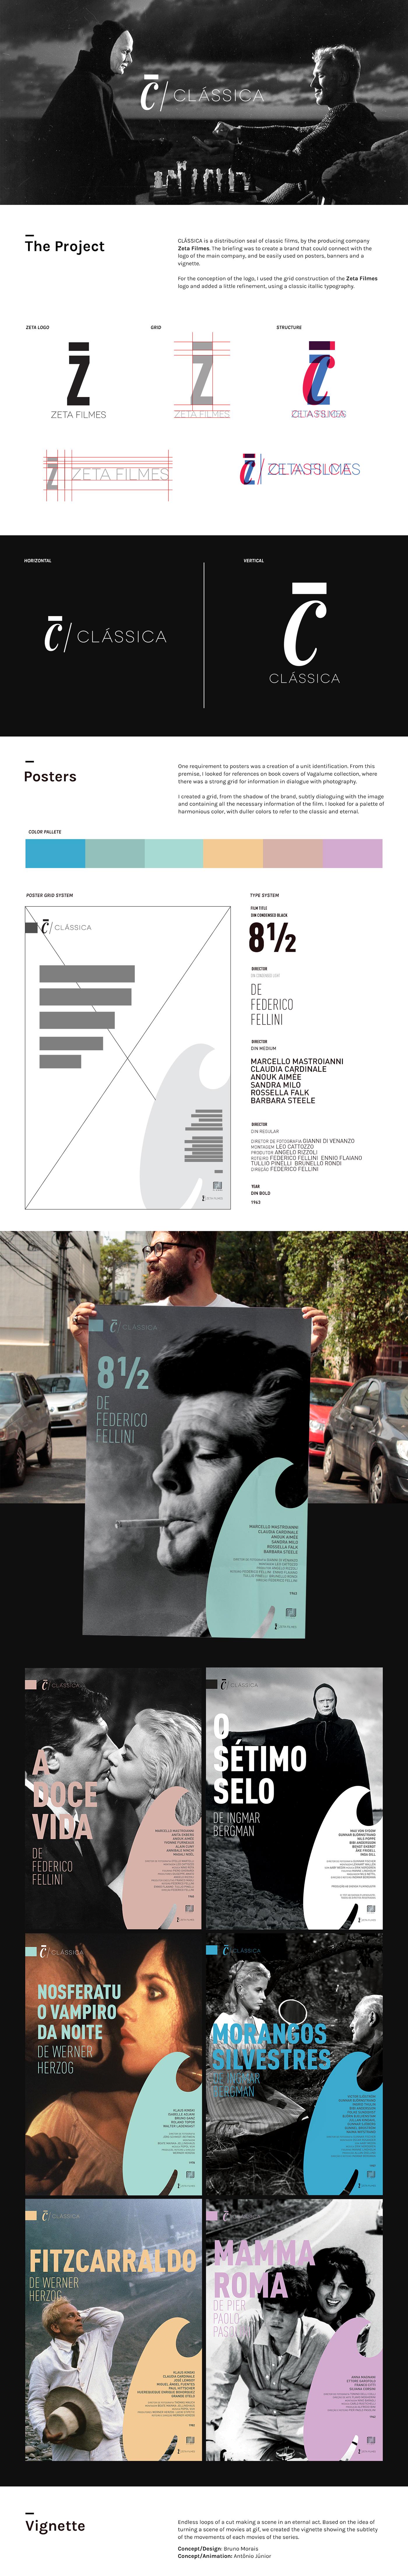 poster Cinema design branding